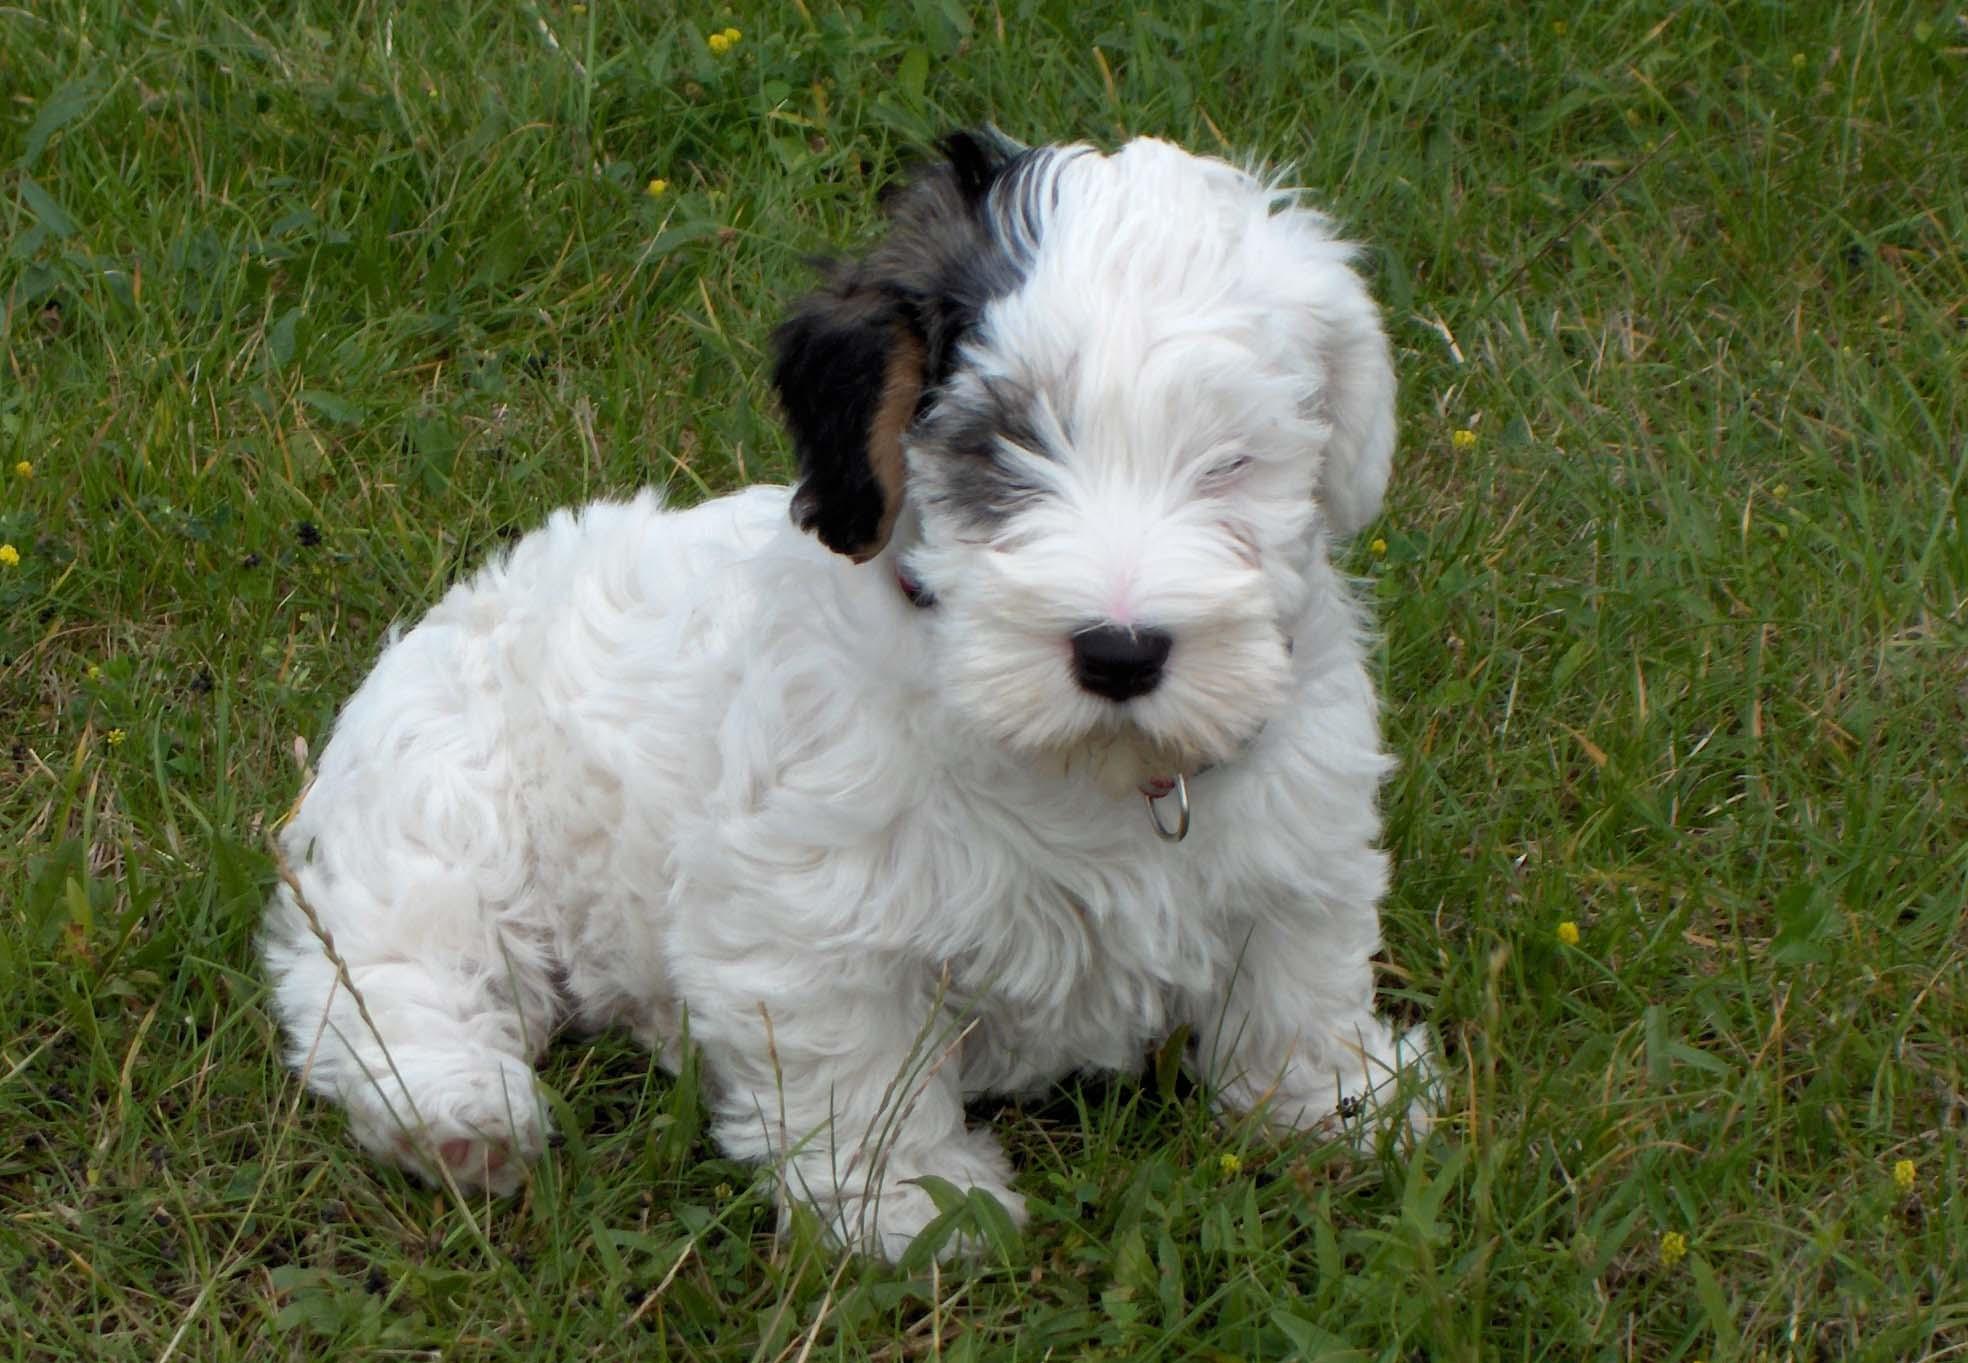 Cute Sealyham Terrier puppy wallpaper